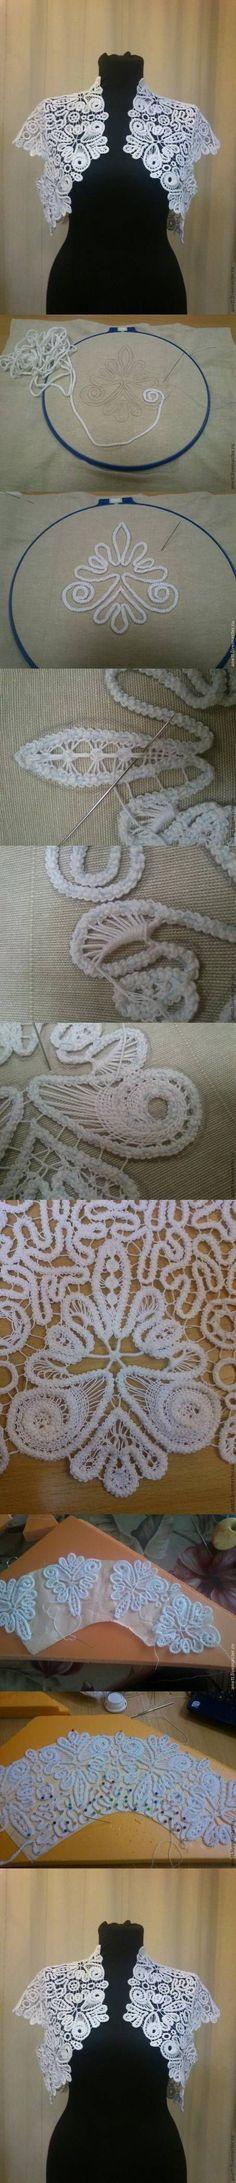 DIY rumana encaje DIY Proyectos | UsefulDIY.com